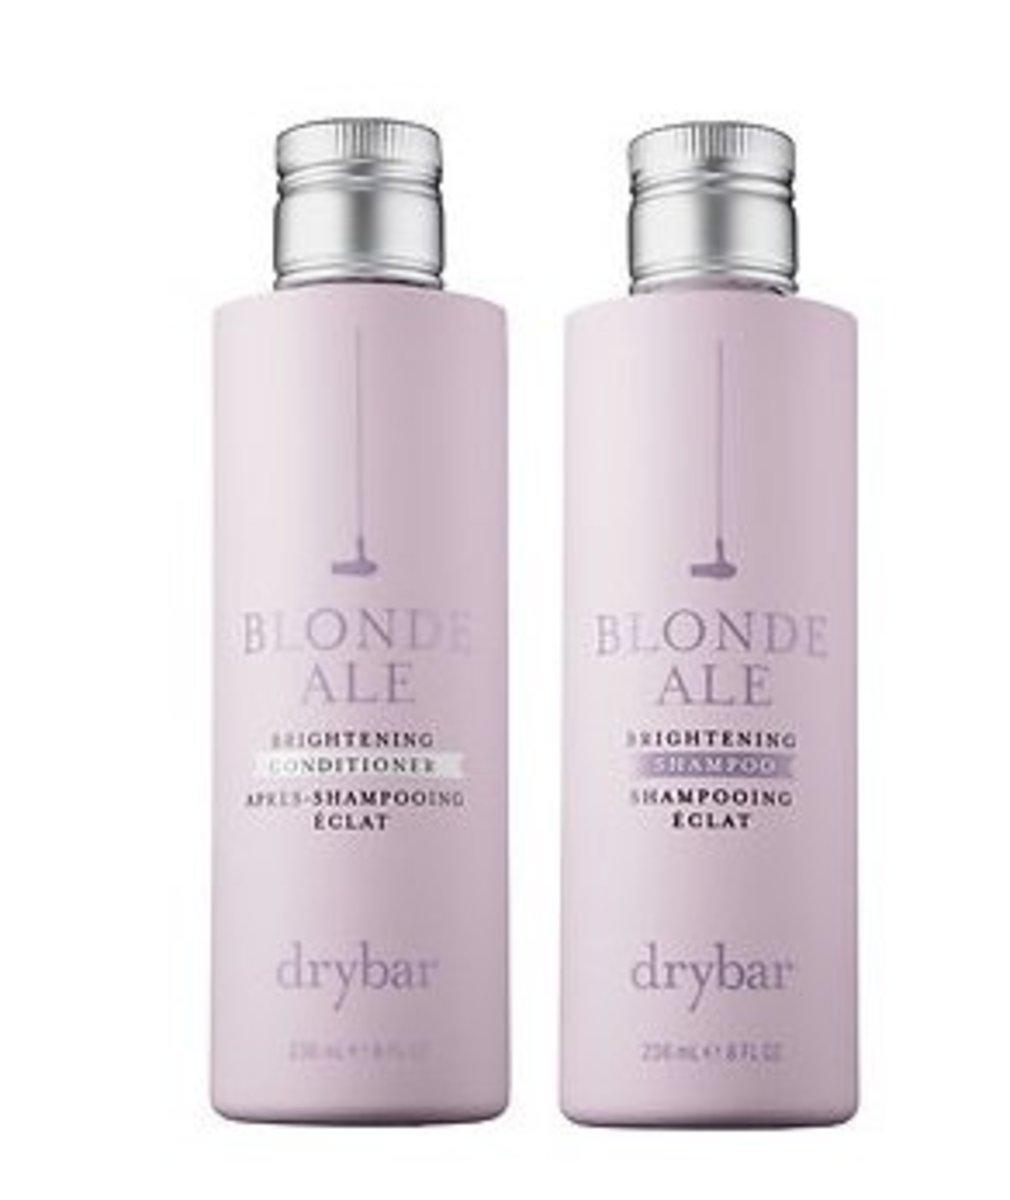 DRYBAR Blonde Ale Brightening Shampoo - 8oz  27$